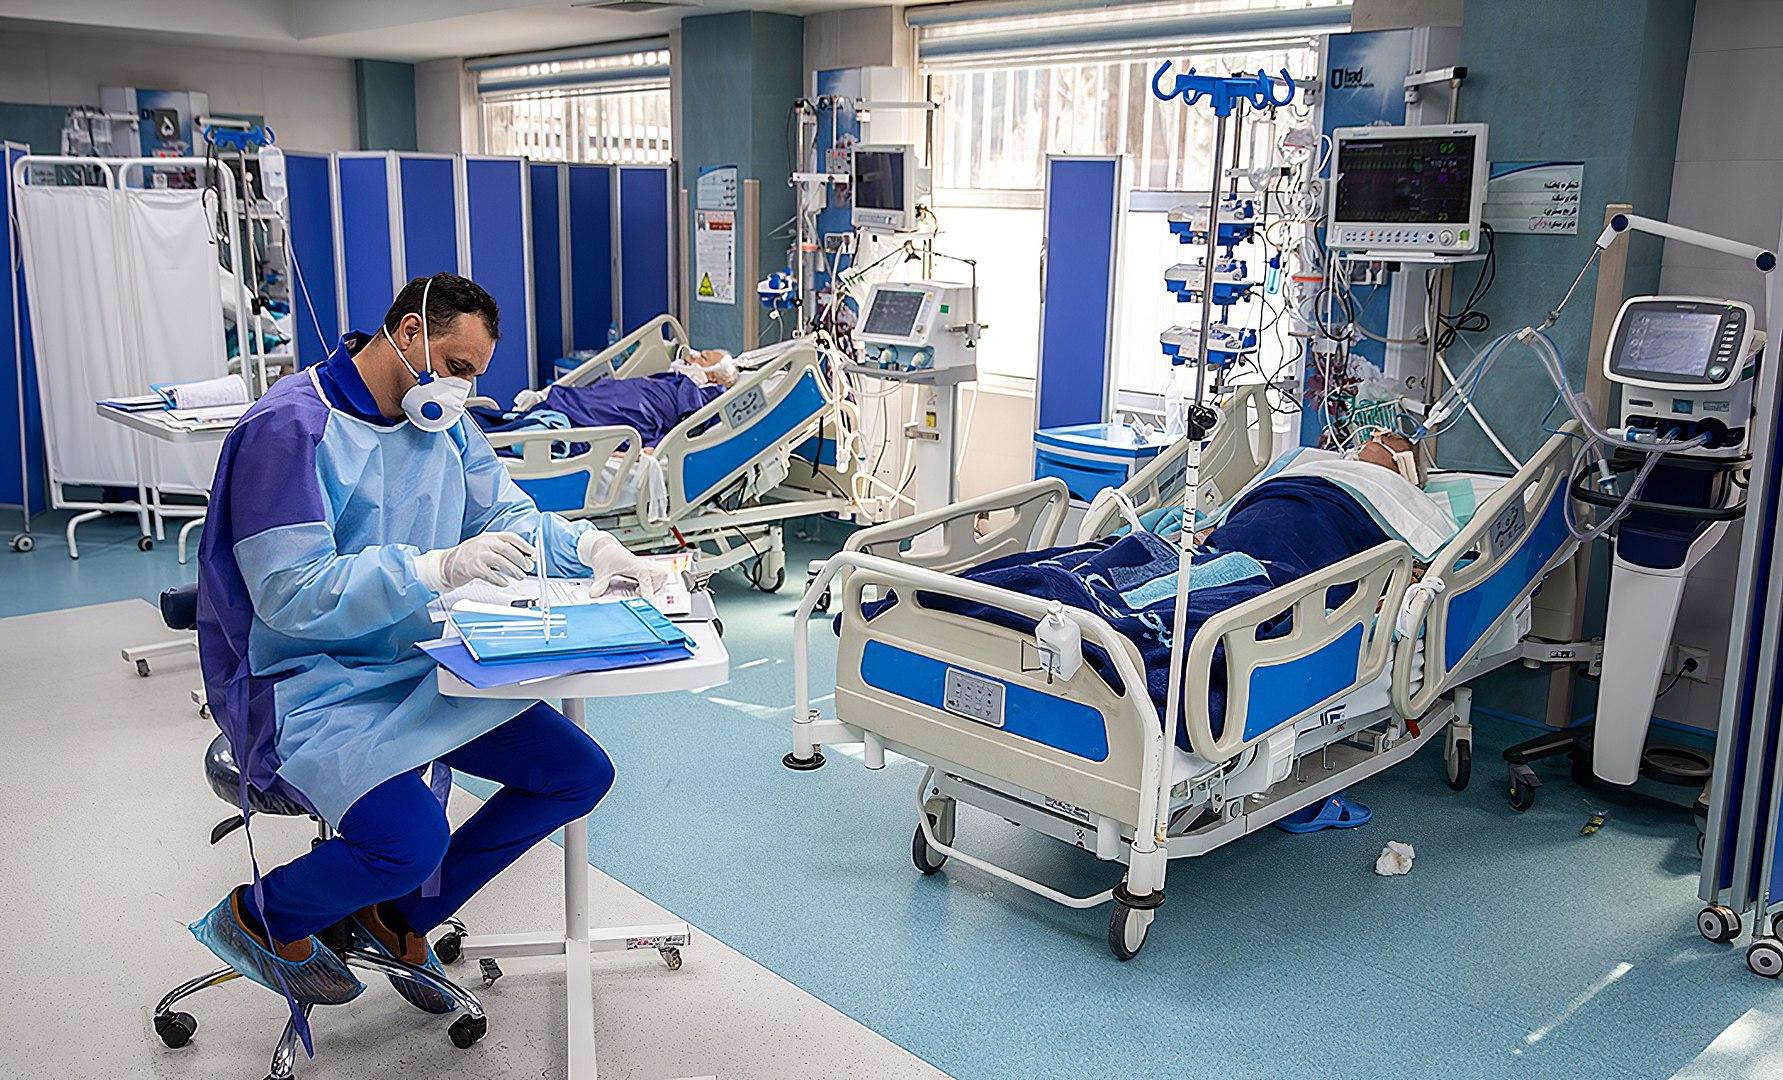 Covid 19 patient